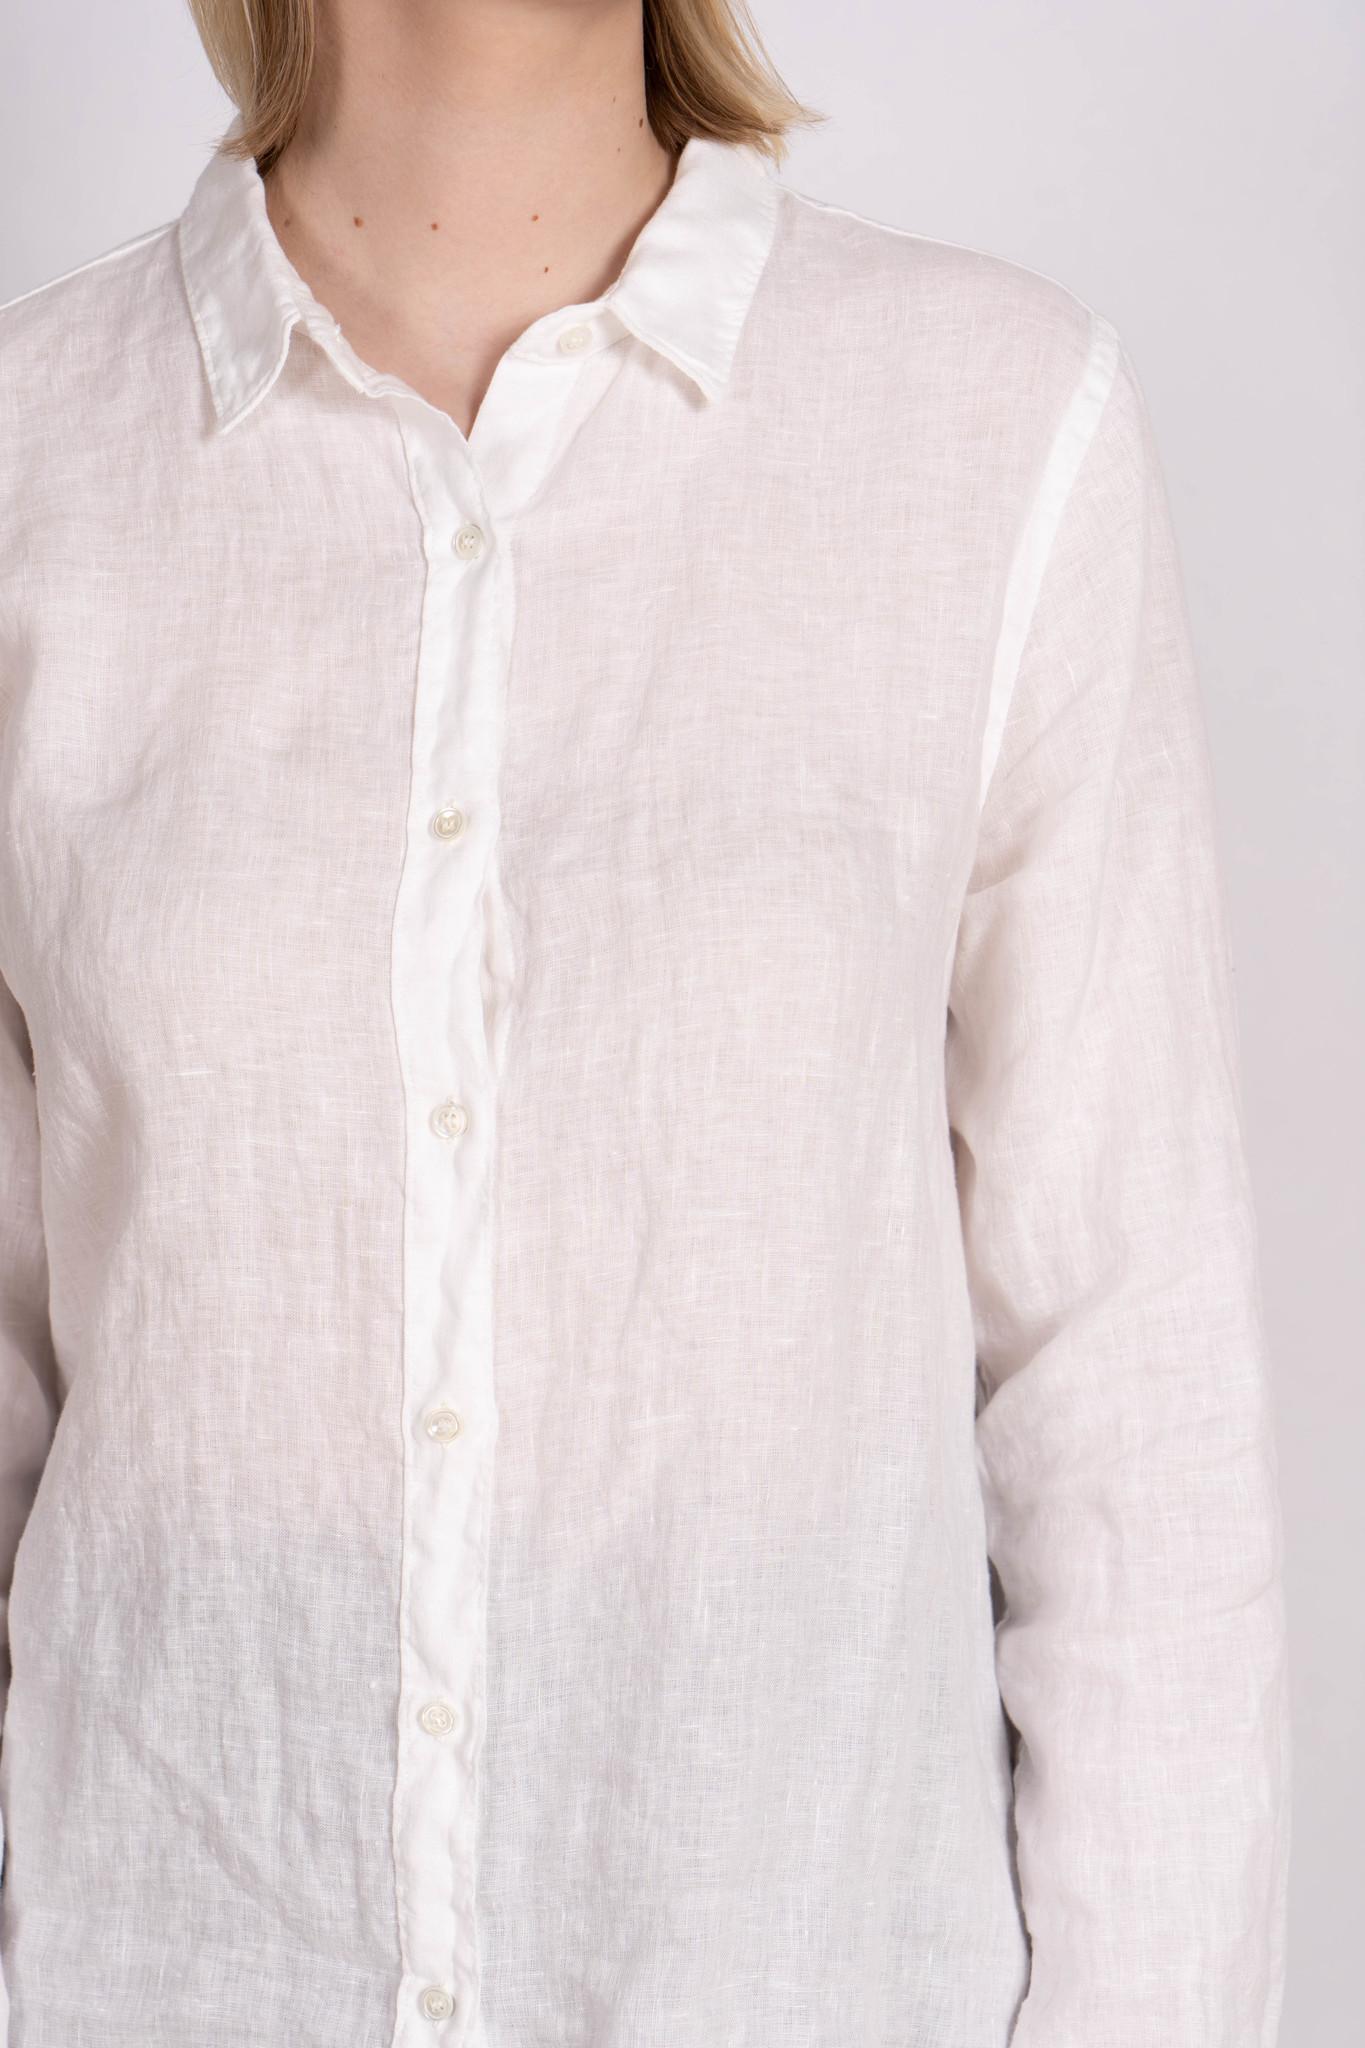 Blouse Side Button White Linen